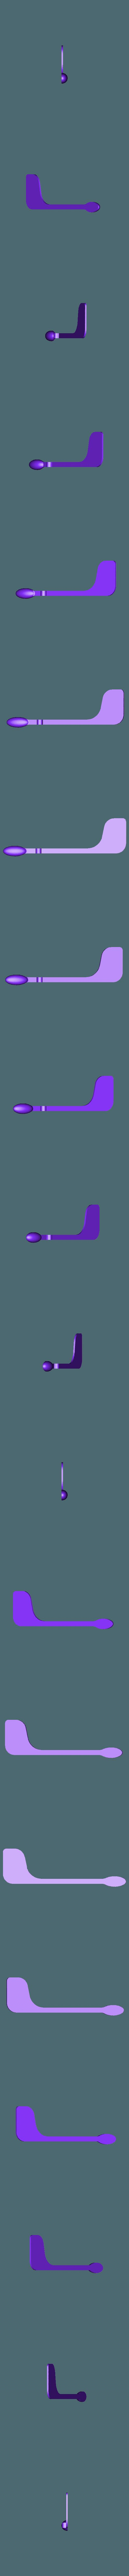 Vane_Arm.stl Download free STL file Anemometer w/ Hall Effect Sensor • Object to 3D print, SeanTheITGuy